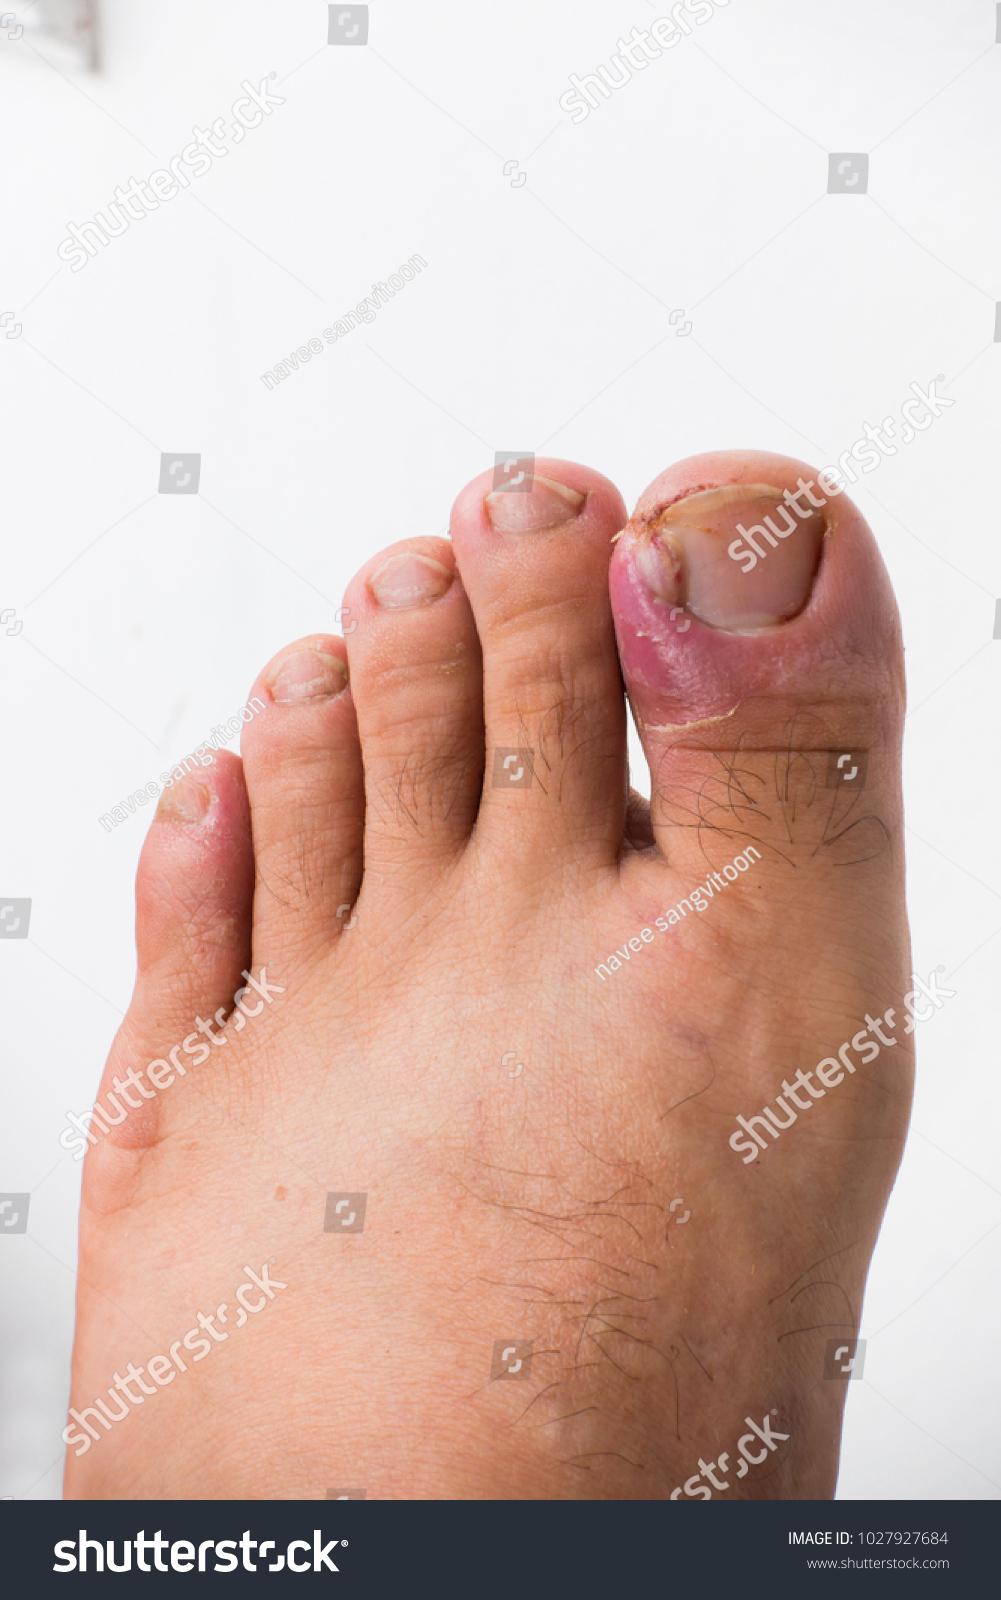 Close Ingrown Toenail Inflamed Fingernails Stock Photo (Royalty Free ...